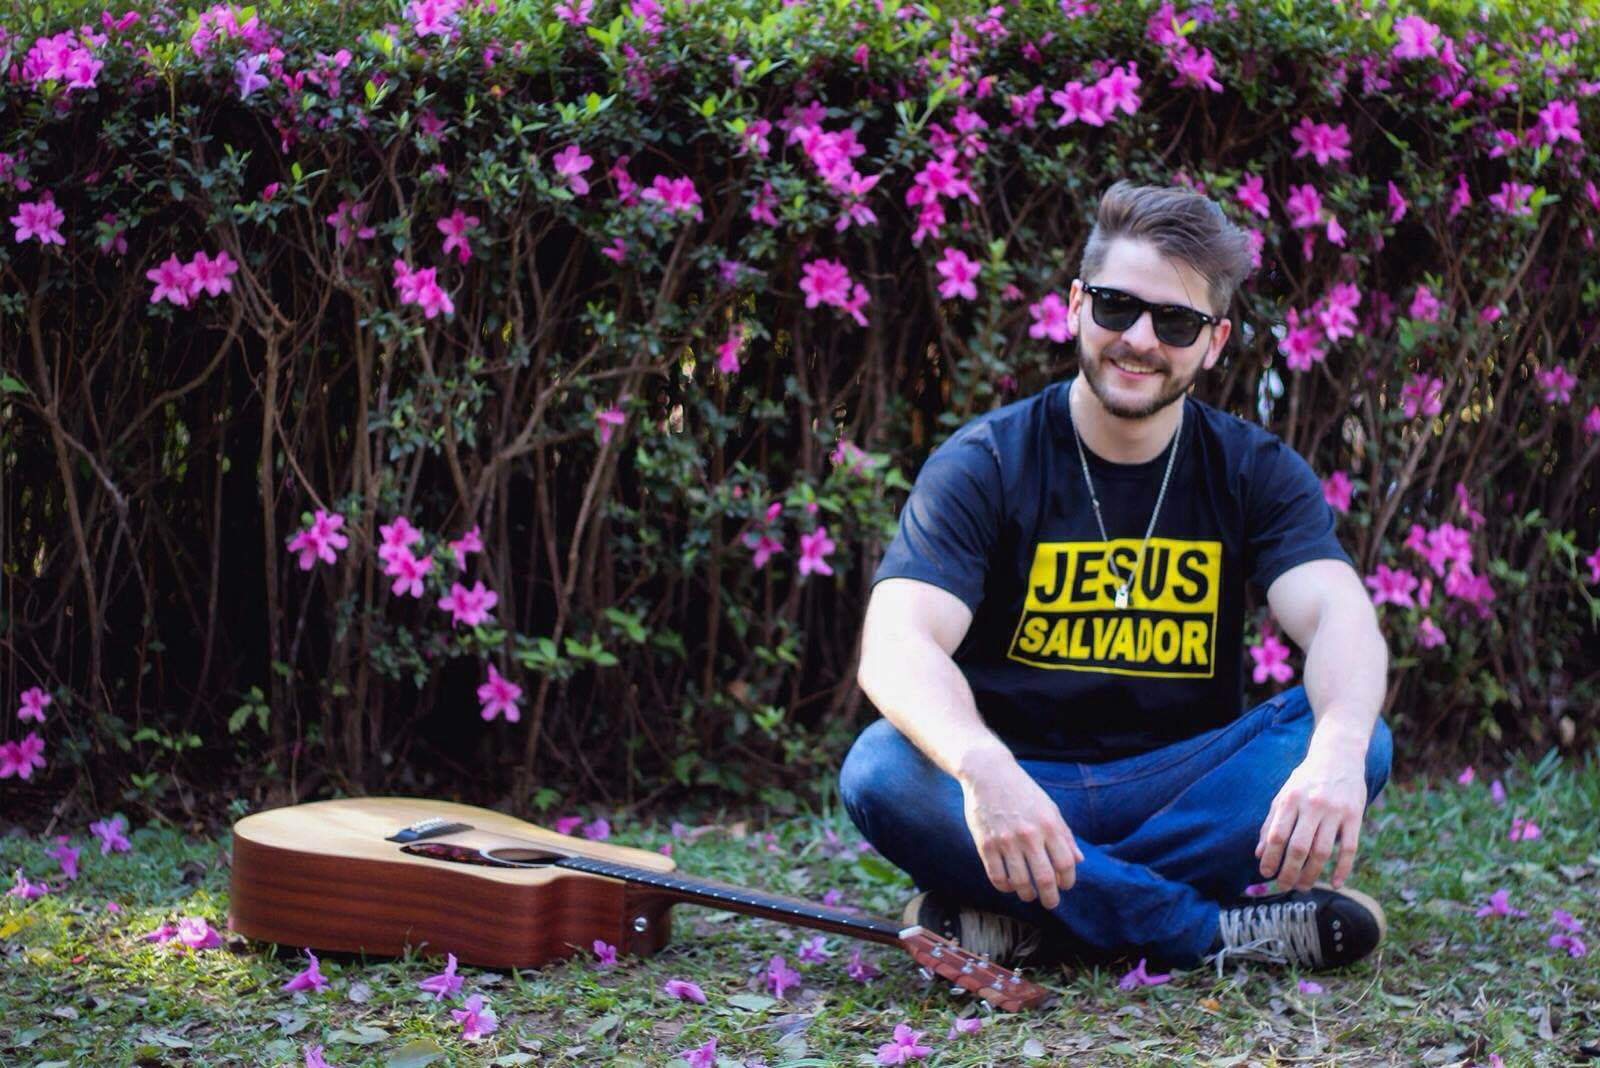 moda evangélica, moda masculina, camiseta evangelica, estampa cristã, moda cristã, menswear, moda sem censura, alex cursino, blog de moda, 5